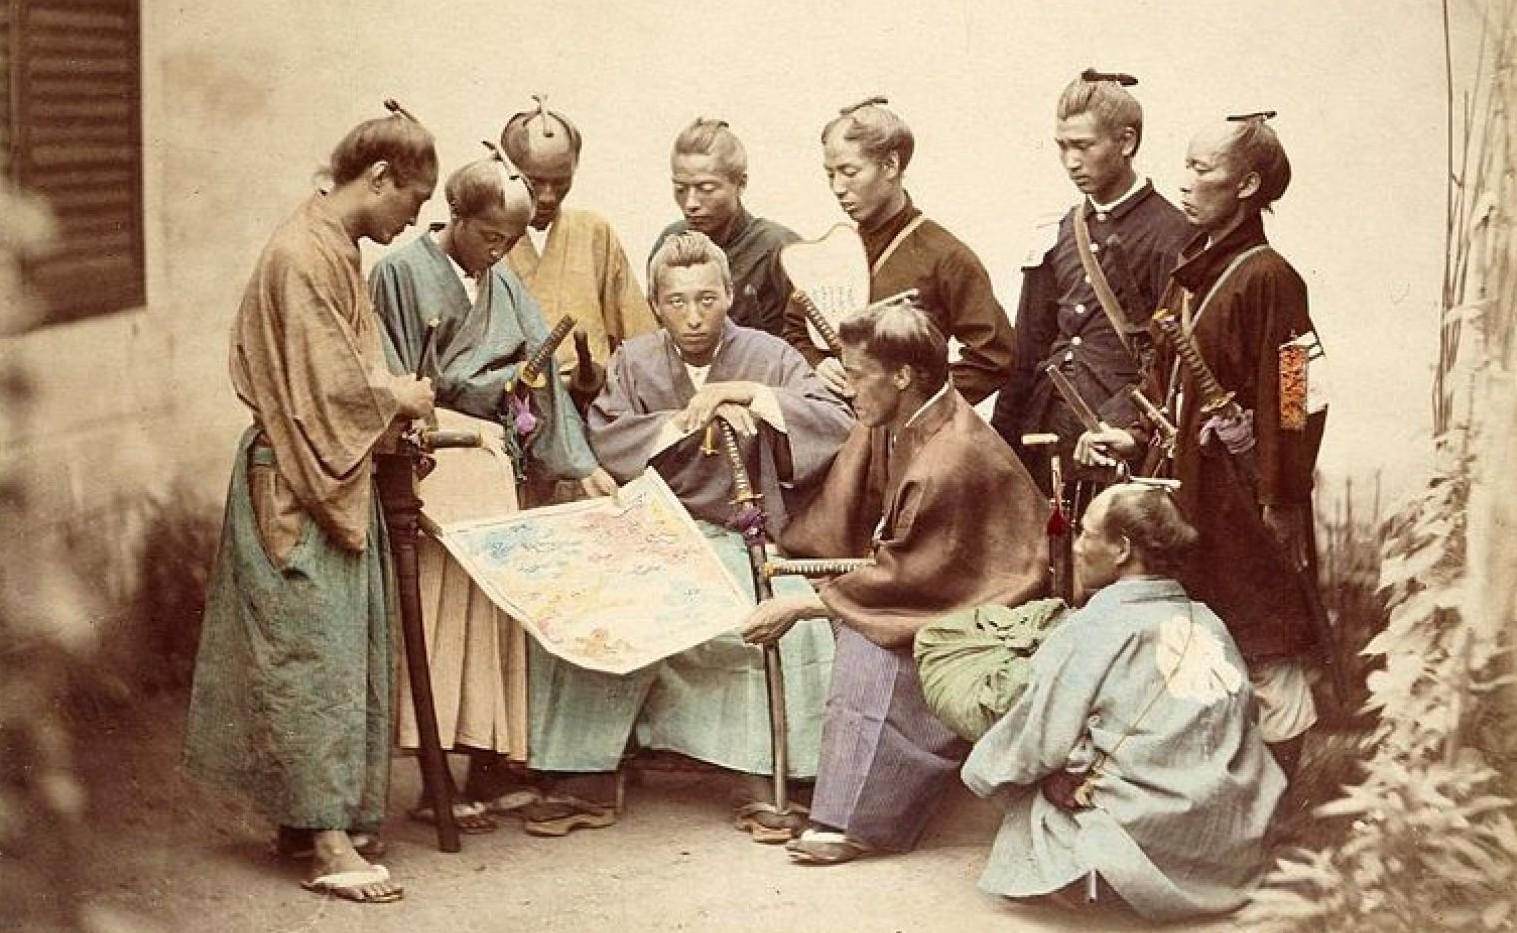 японцы насилуют без сознания